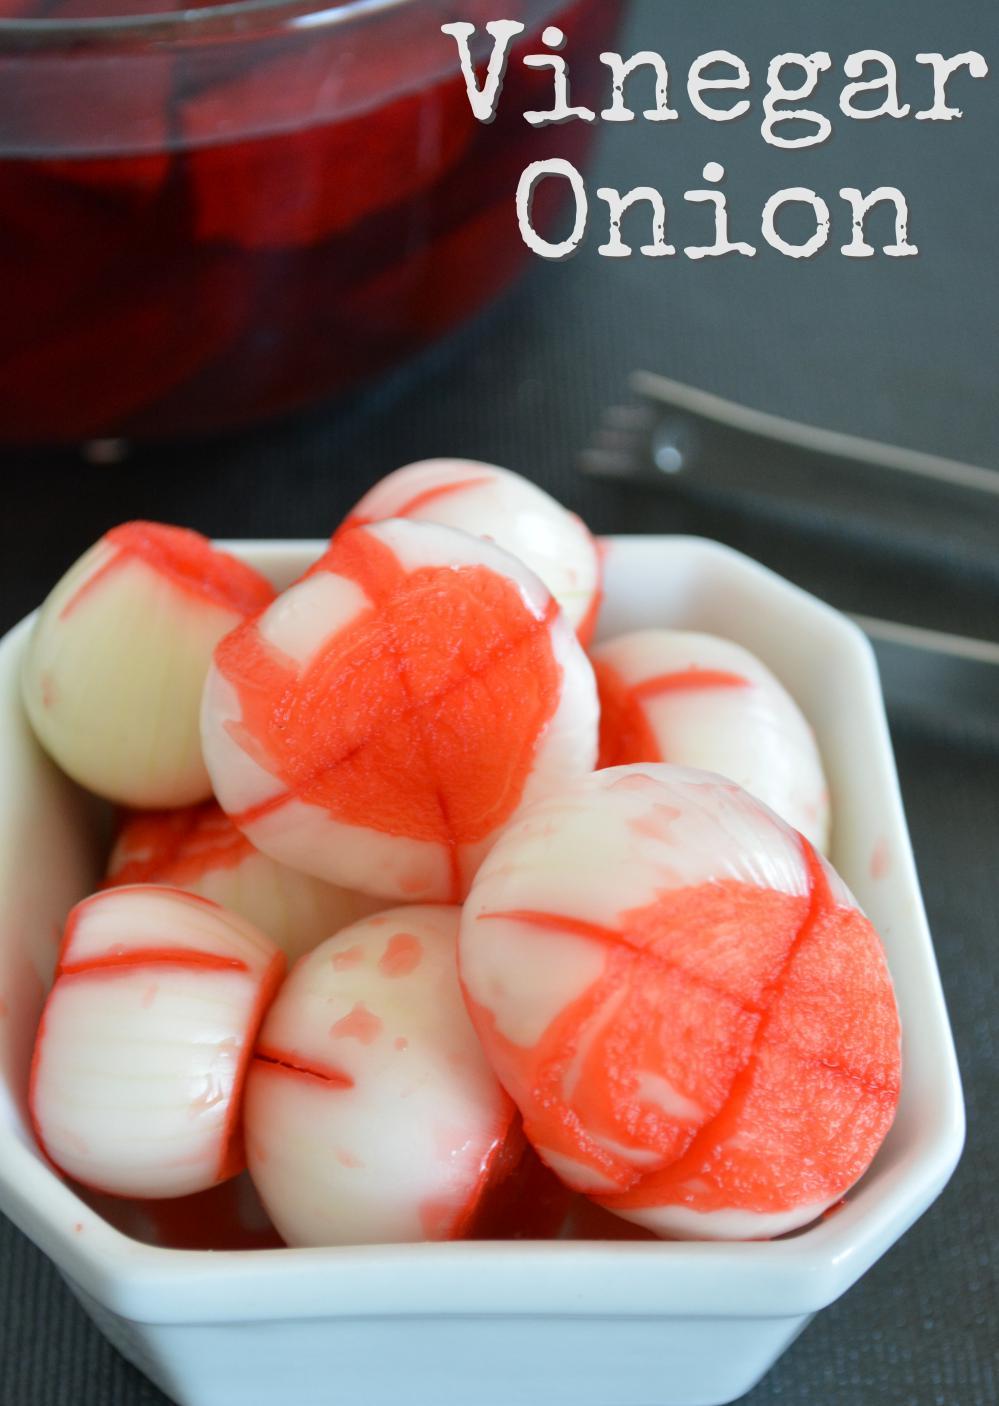 Vinegar Onion recipe or Sirke wala pyaaz recipe